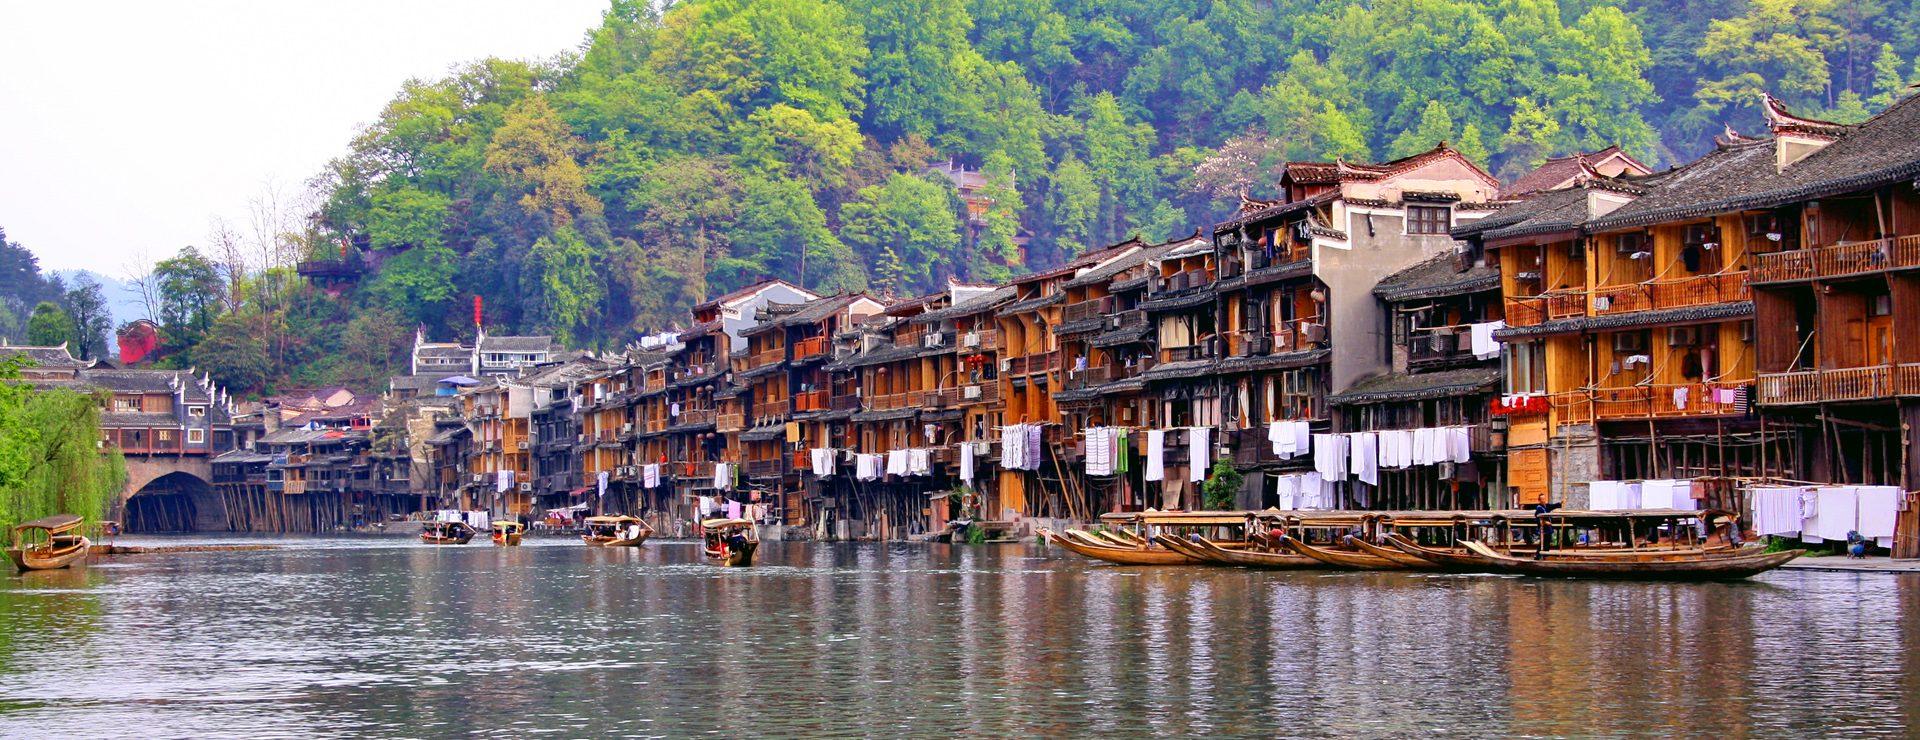 Dehang & Fenghuang